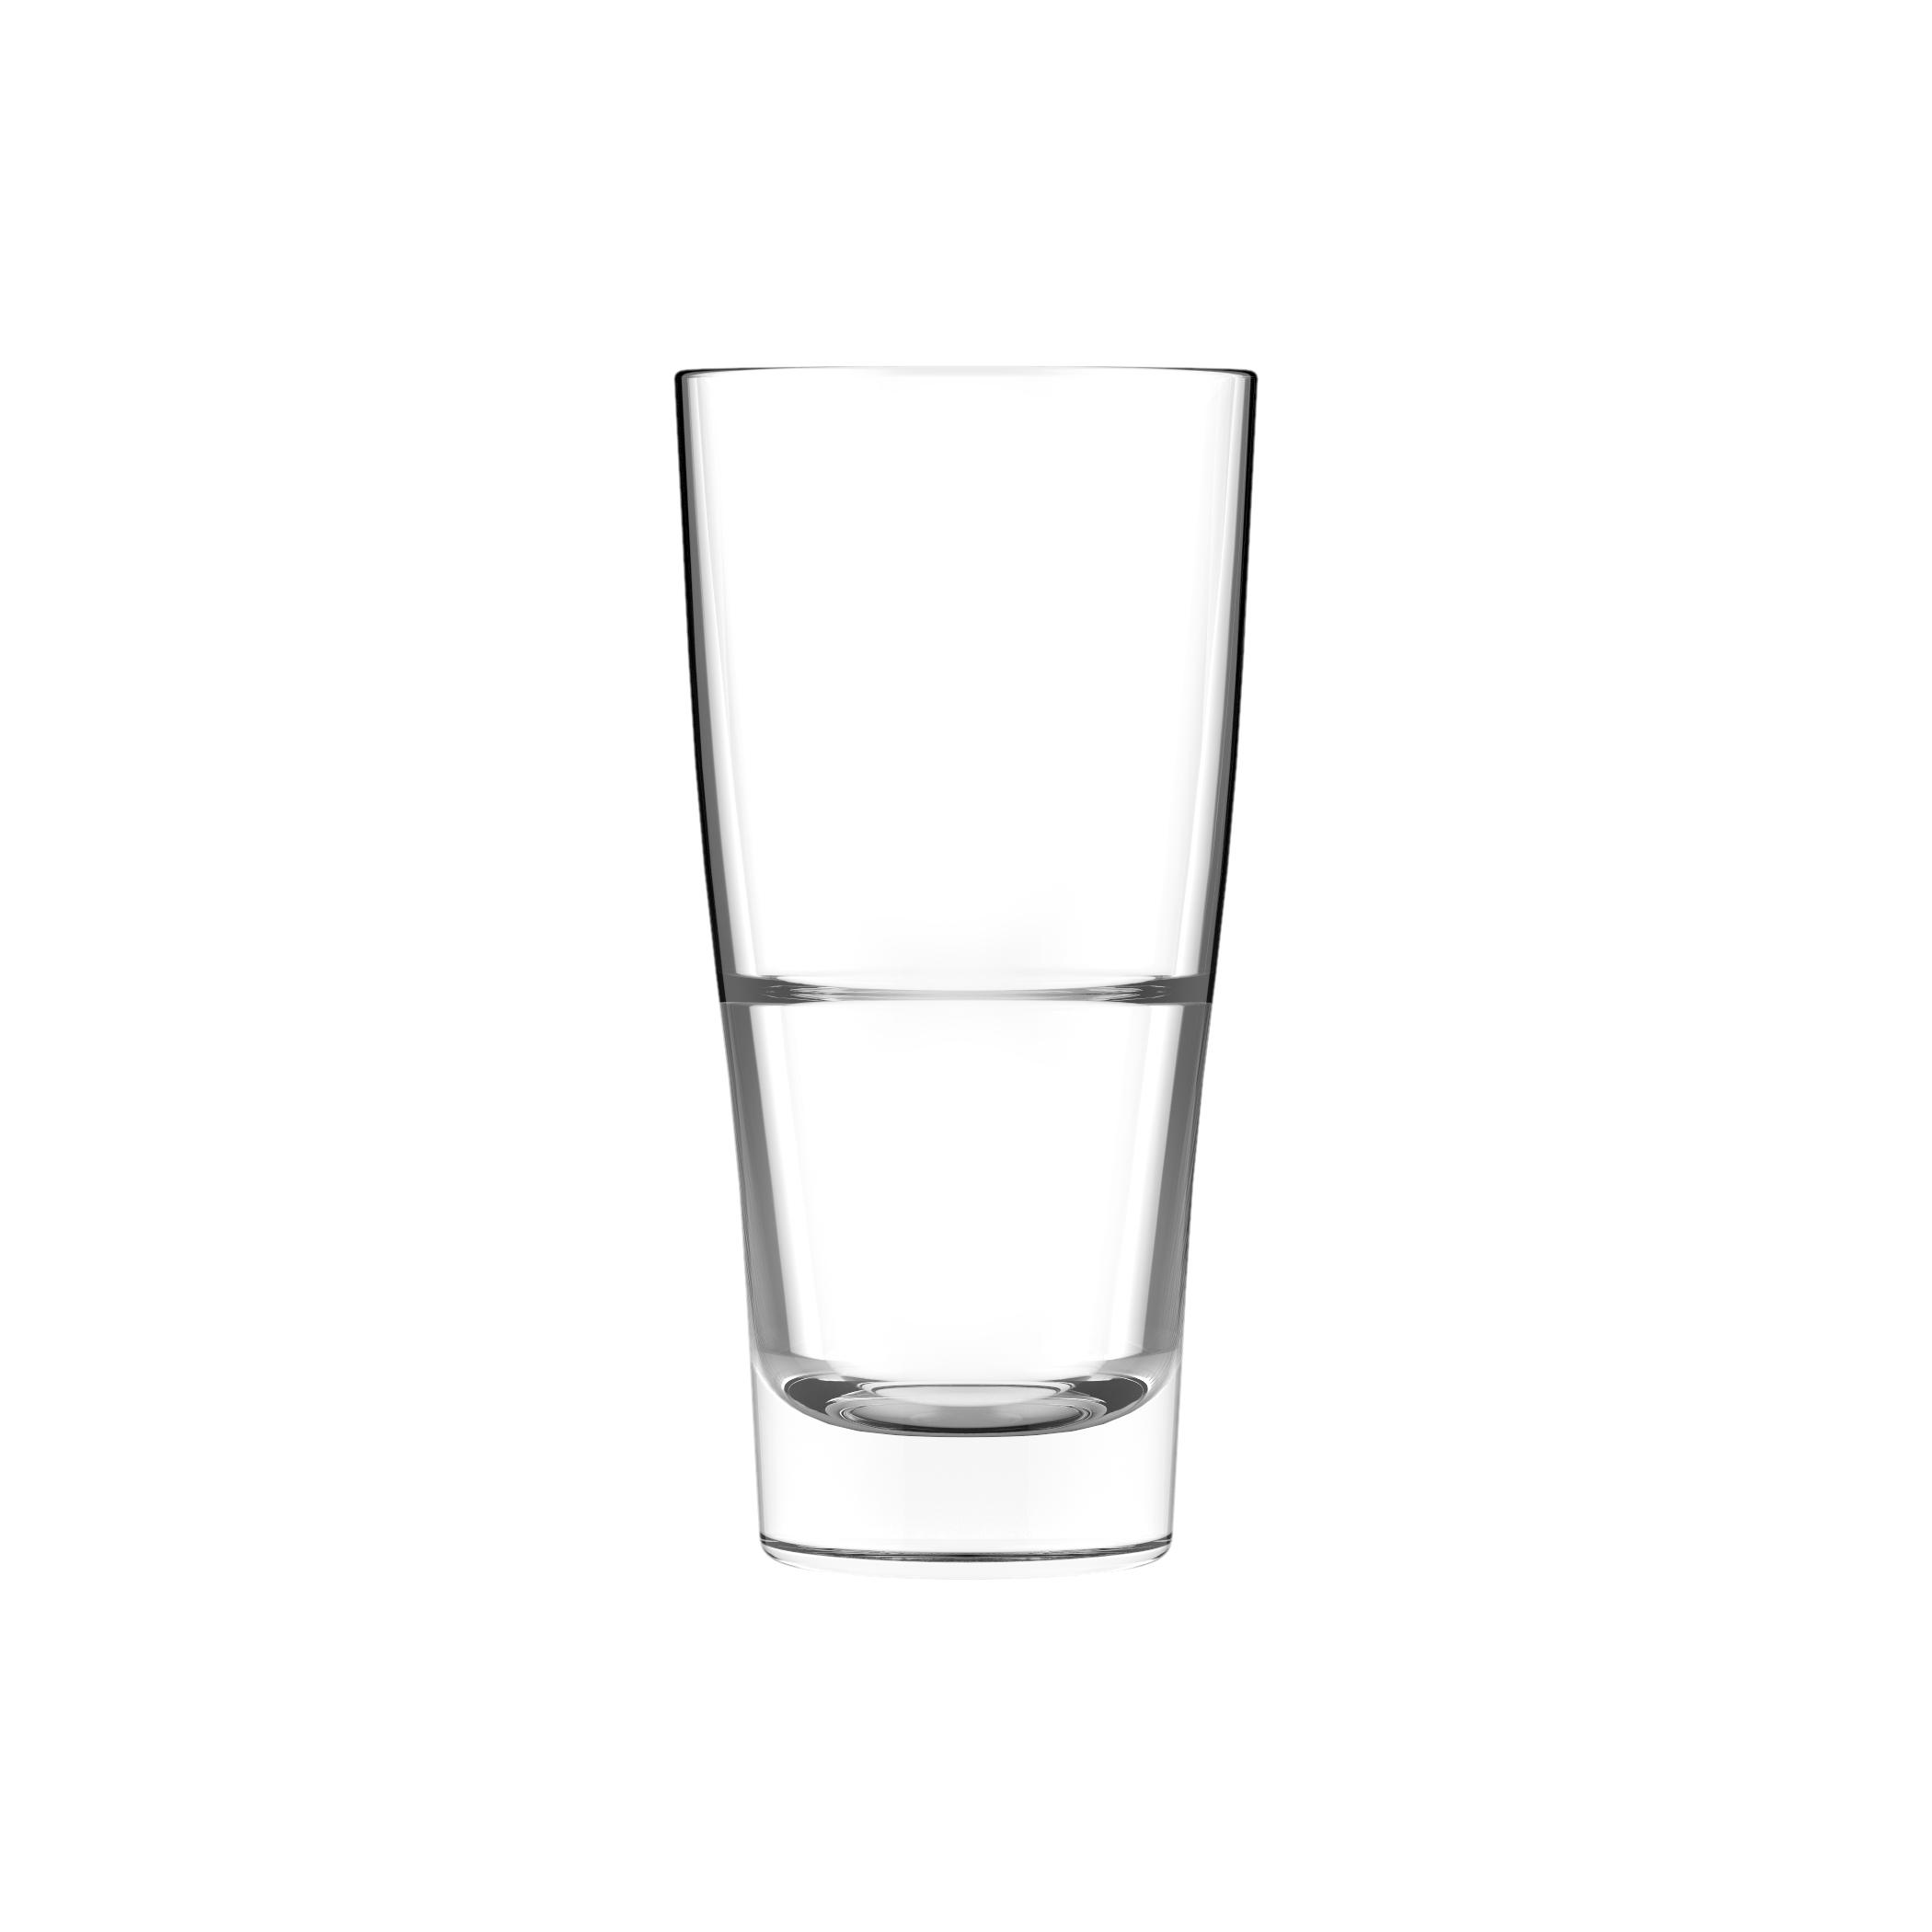 Cardinal N0521 glass, water / tumbler